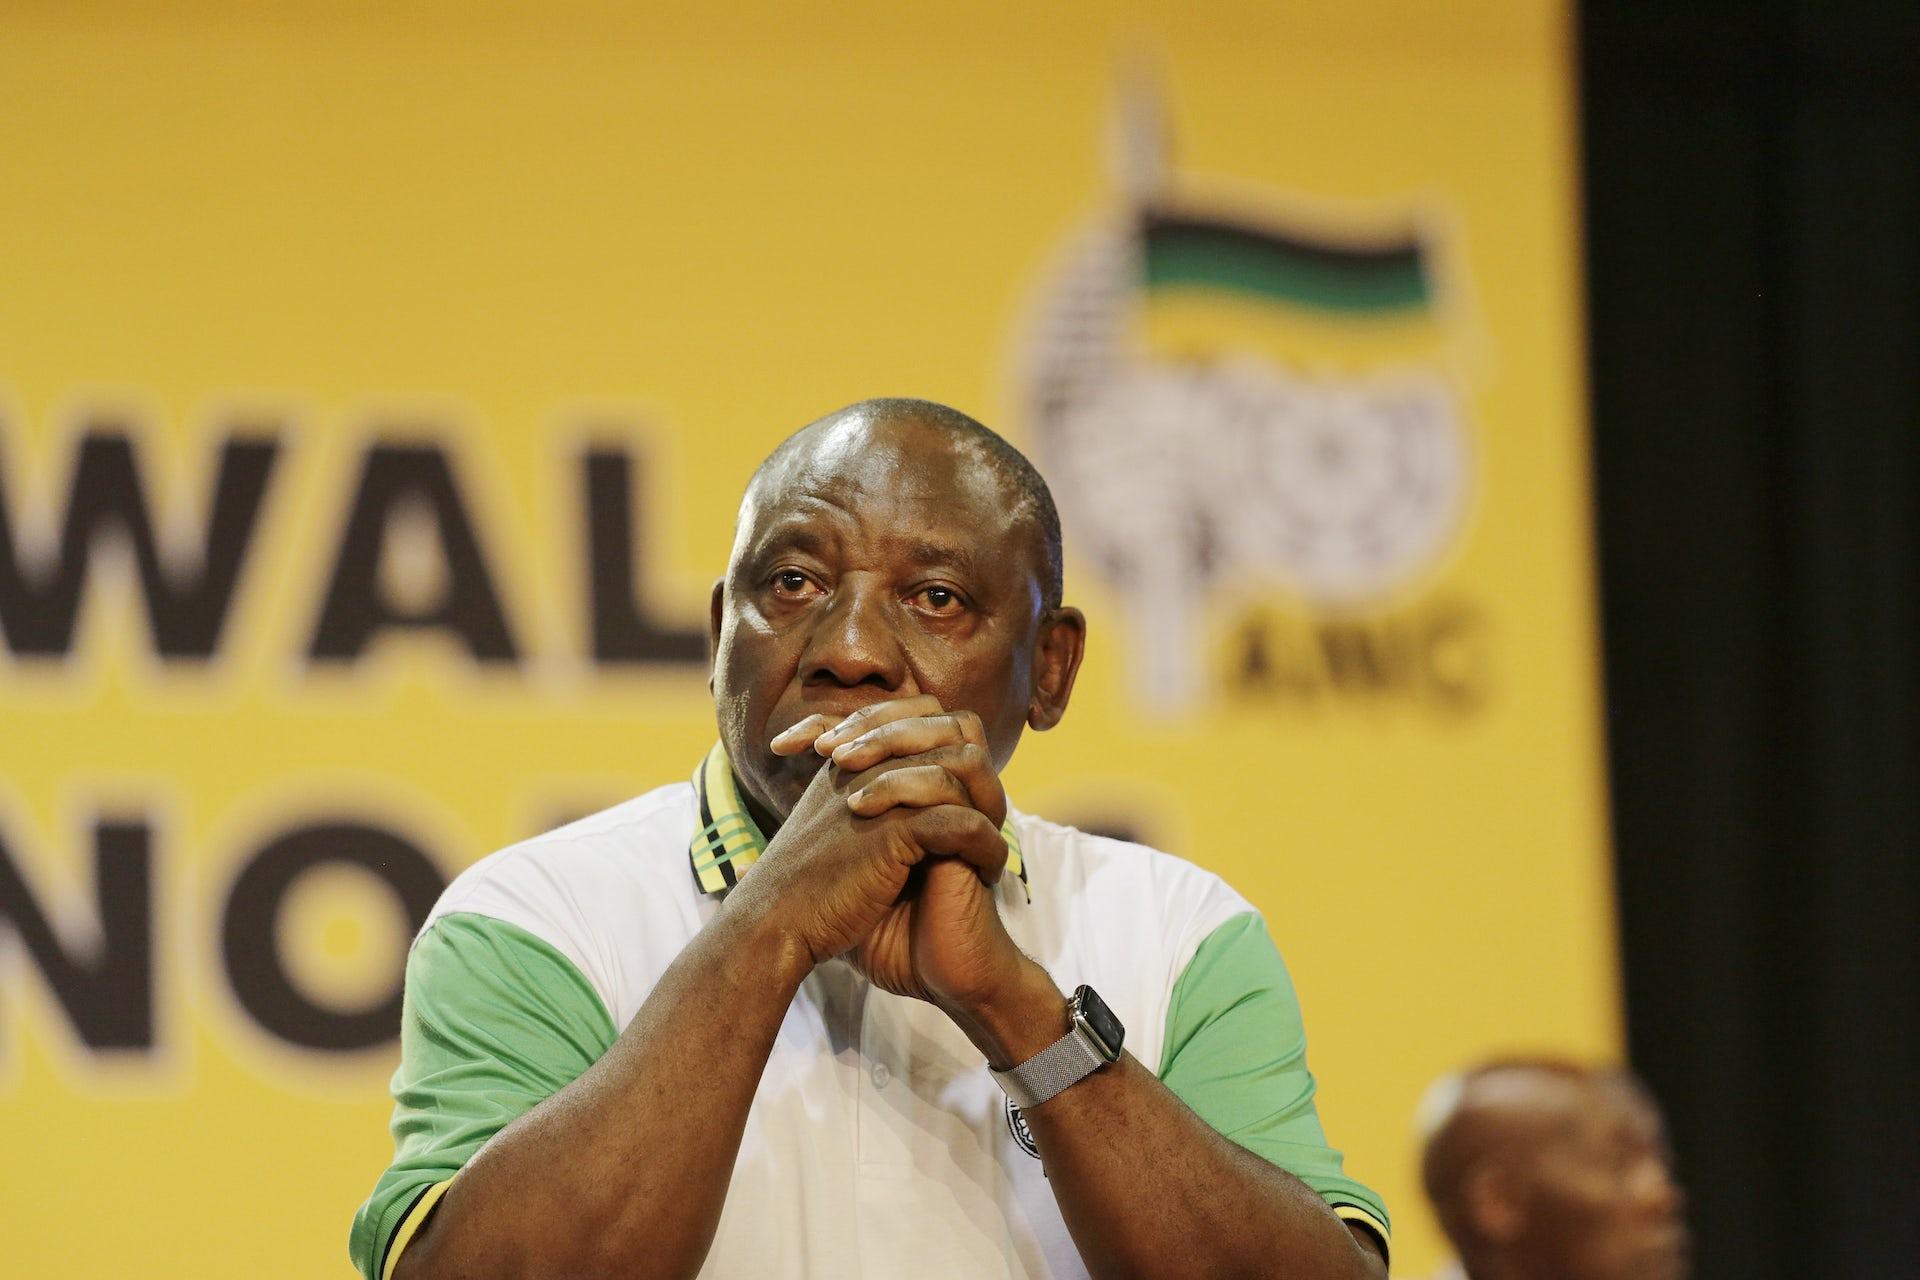 New ANC President Cyril Ramaphosa moments before winning.